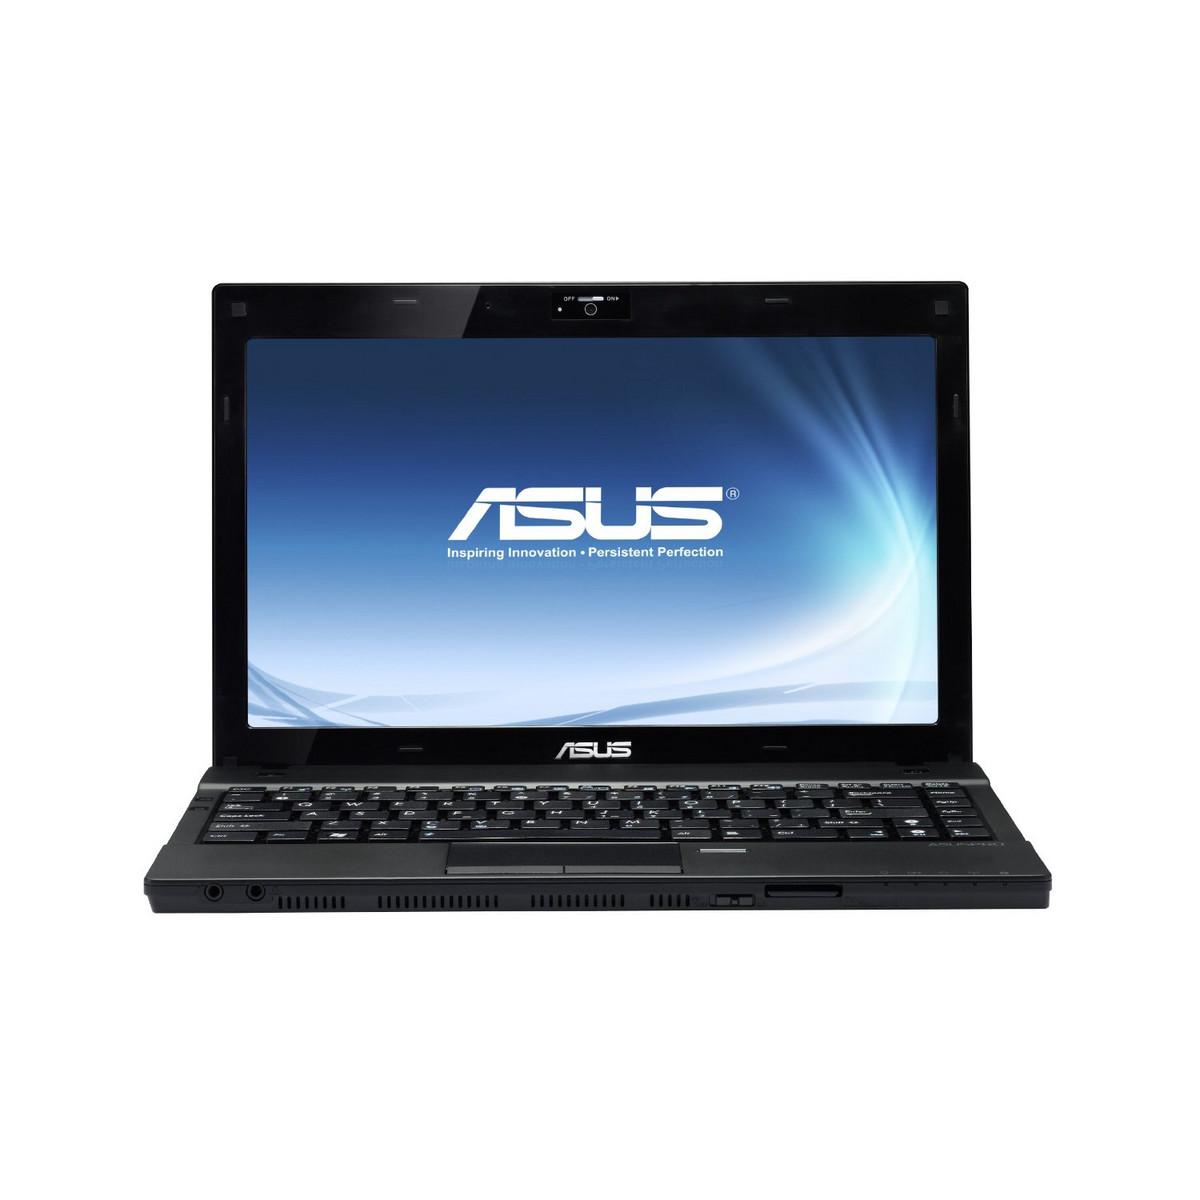 ASUS B23E NOTEBOOK WEBCAM DRIVER FOR MAC DOWNLOAD